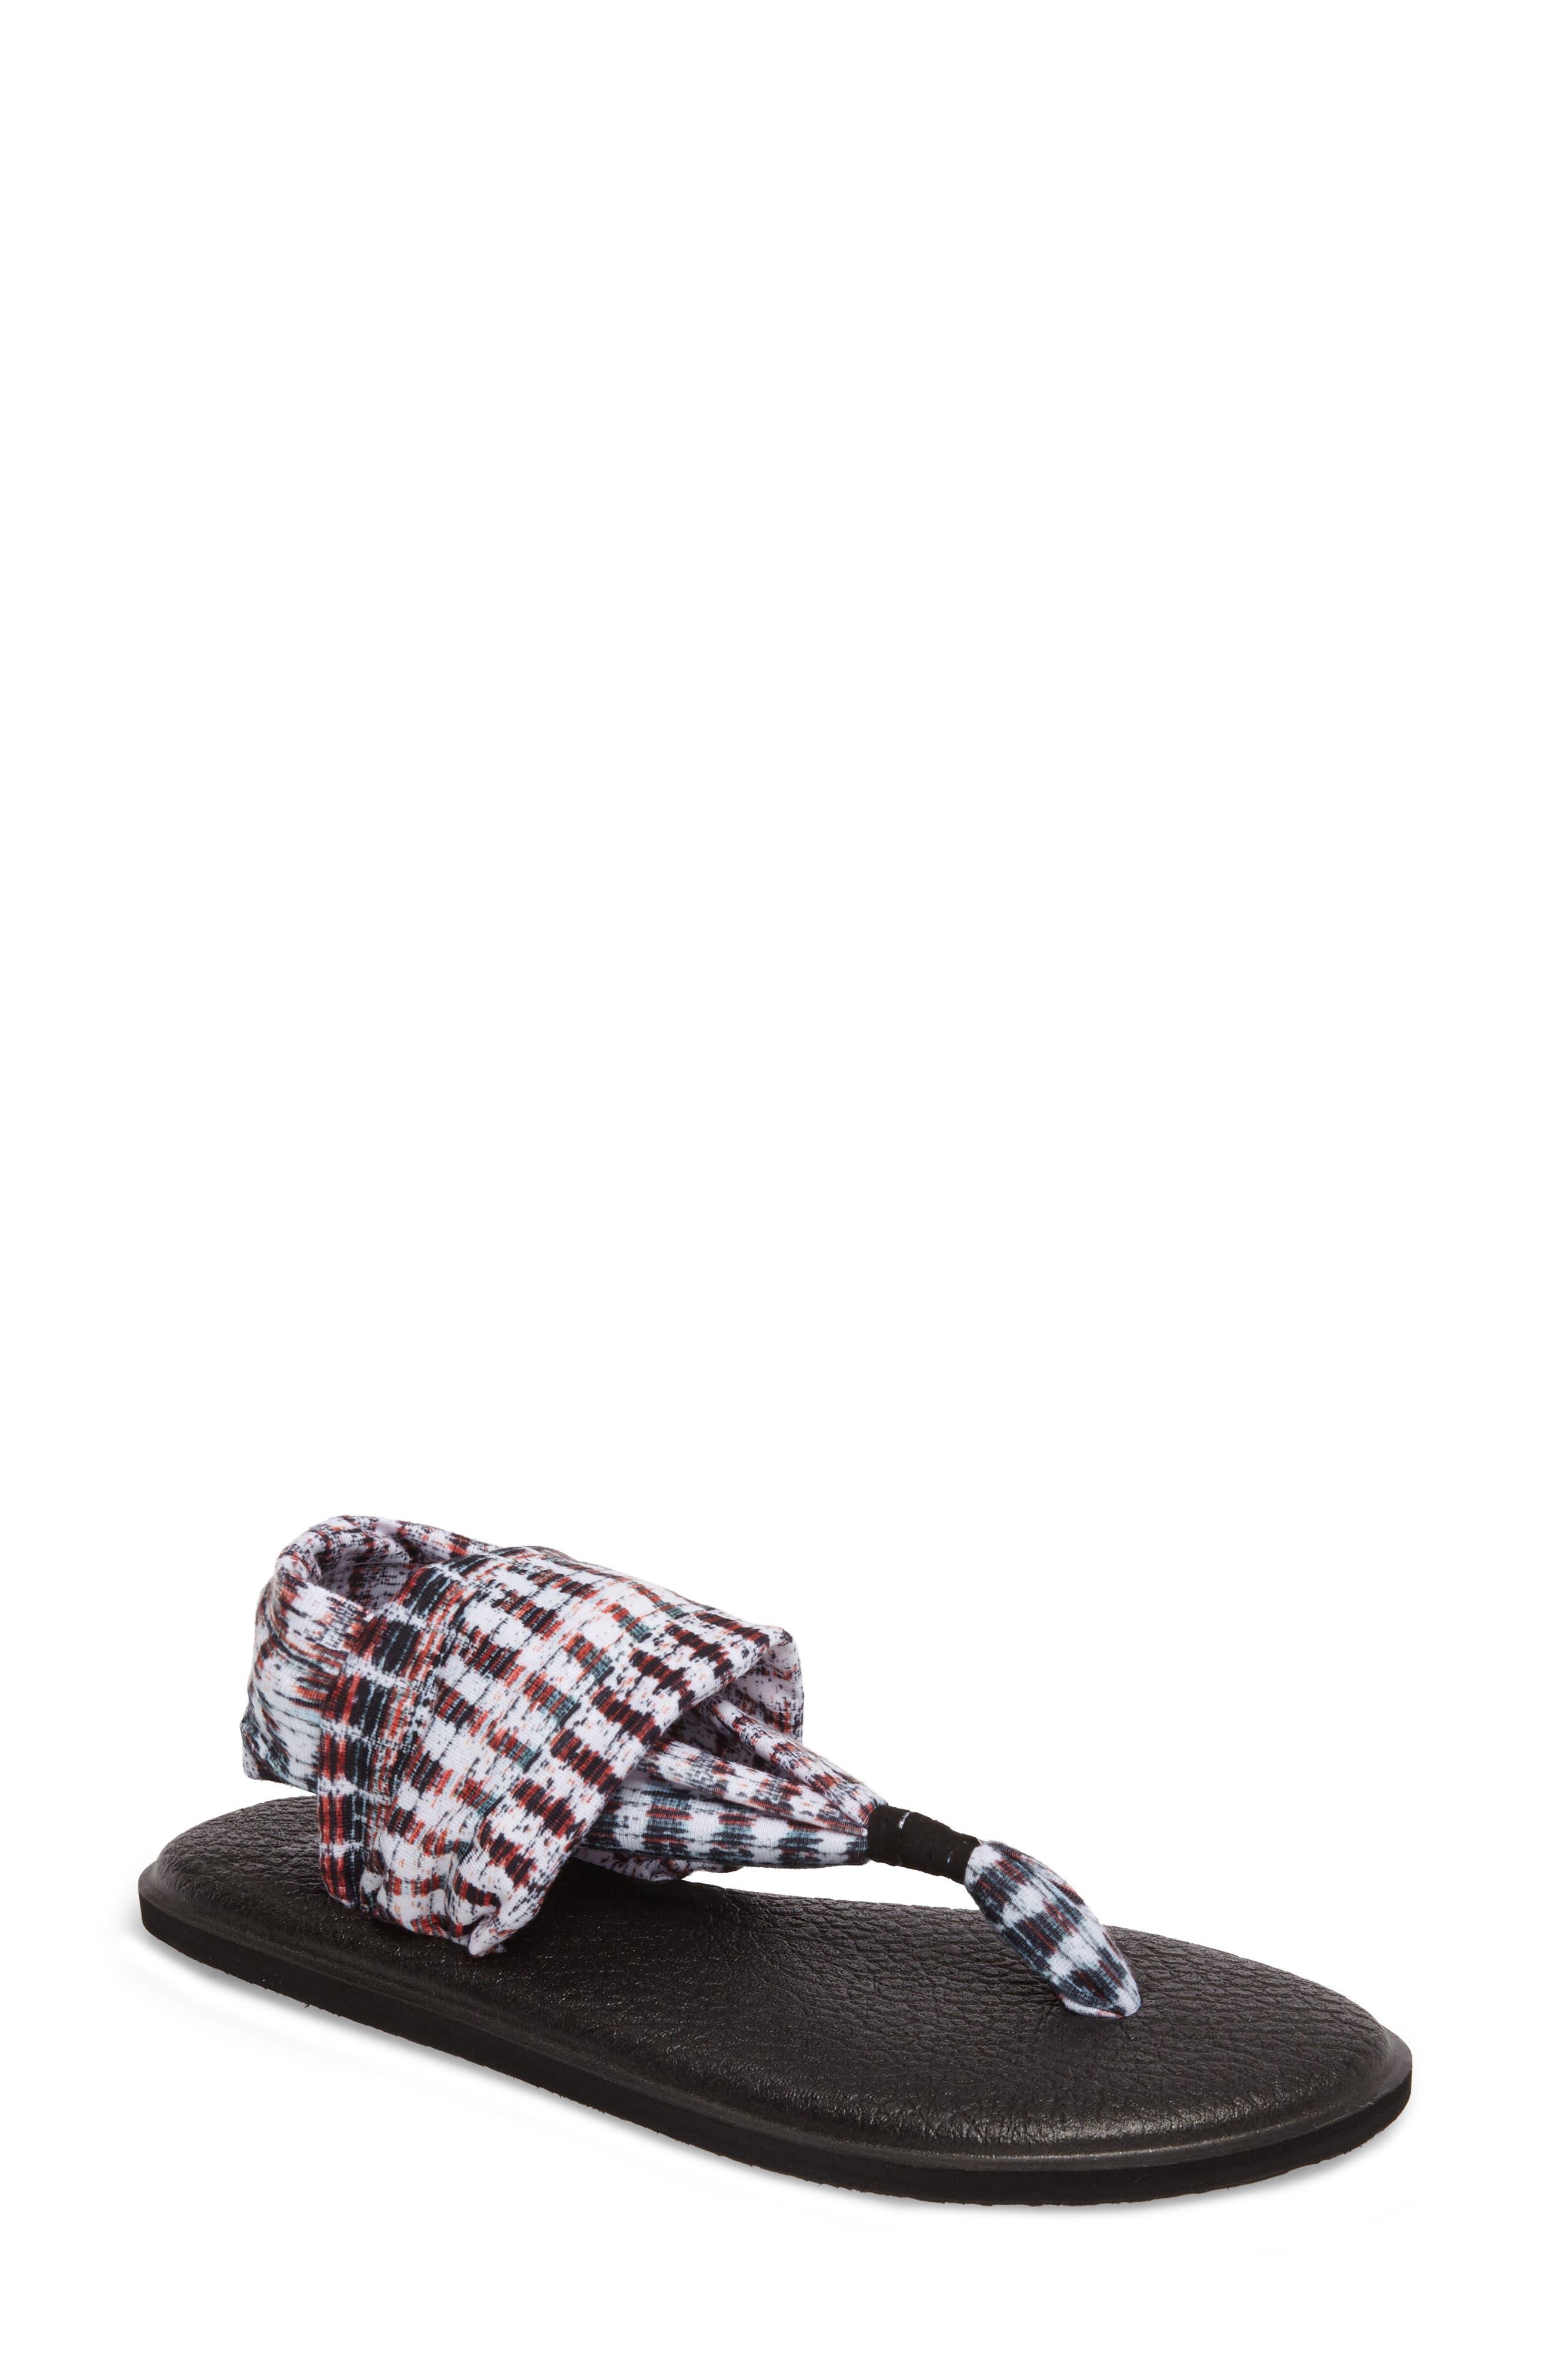 'Yoga Sling 2' Sandal,                             Main thumbnail 20, color,